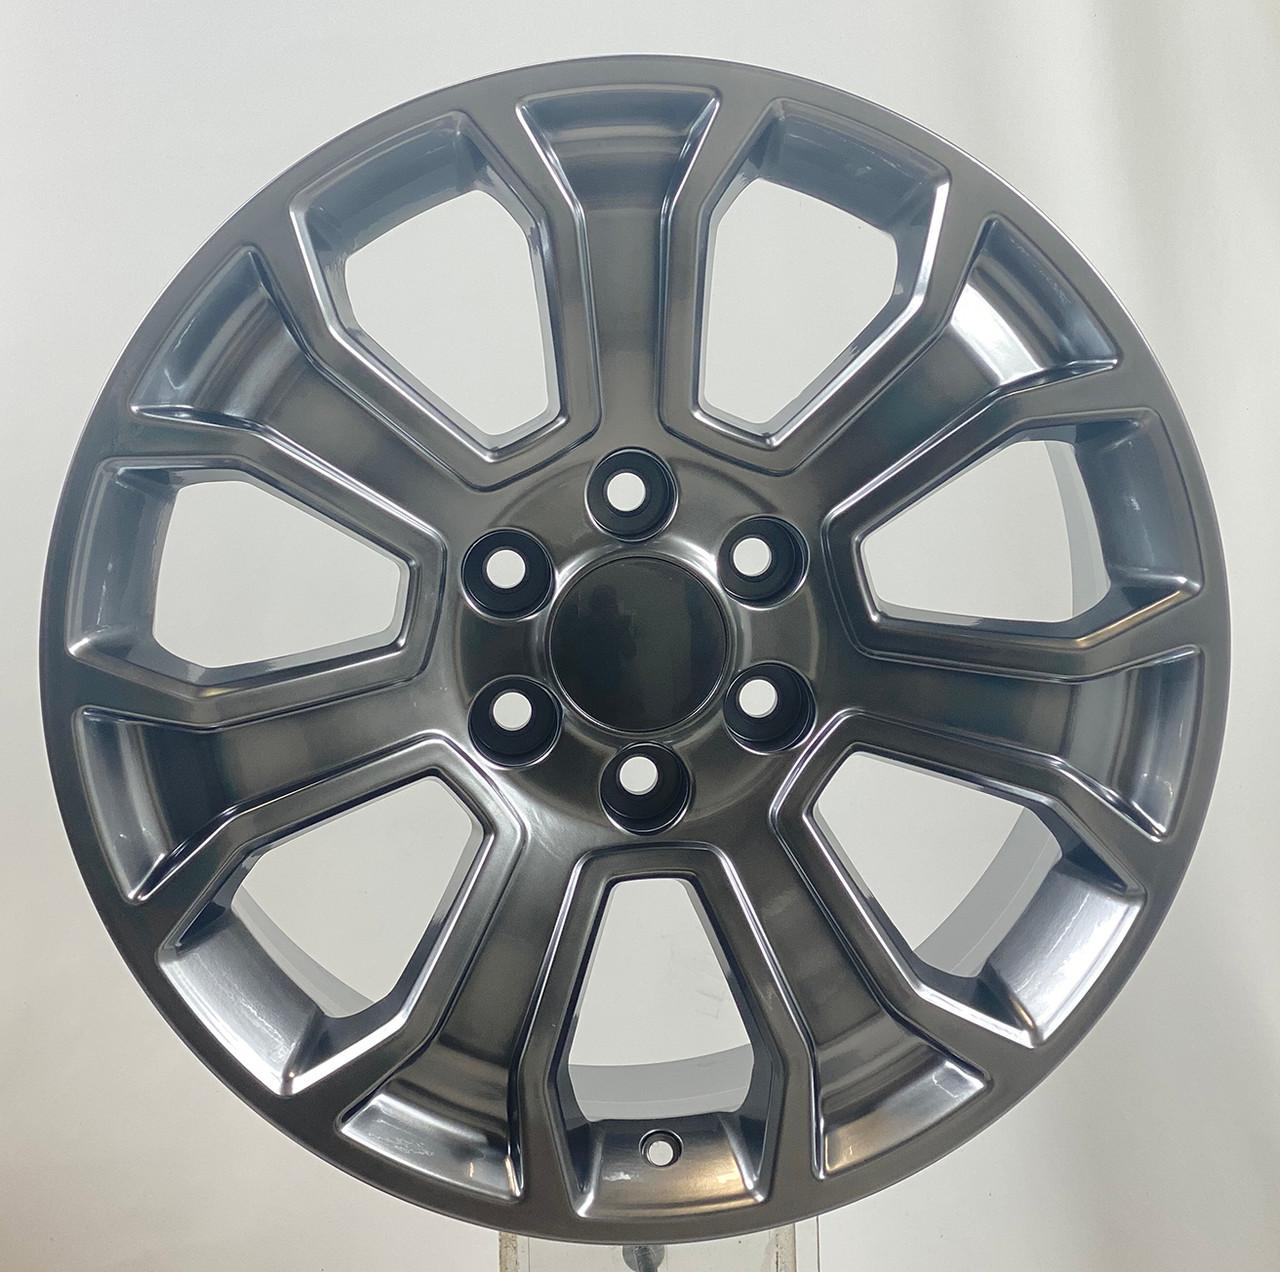 "Hyper Silver 20"" Seven Spoke Wheels for Chevy Silverado, Tahoe, Suburban - New Set of 4"